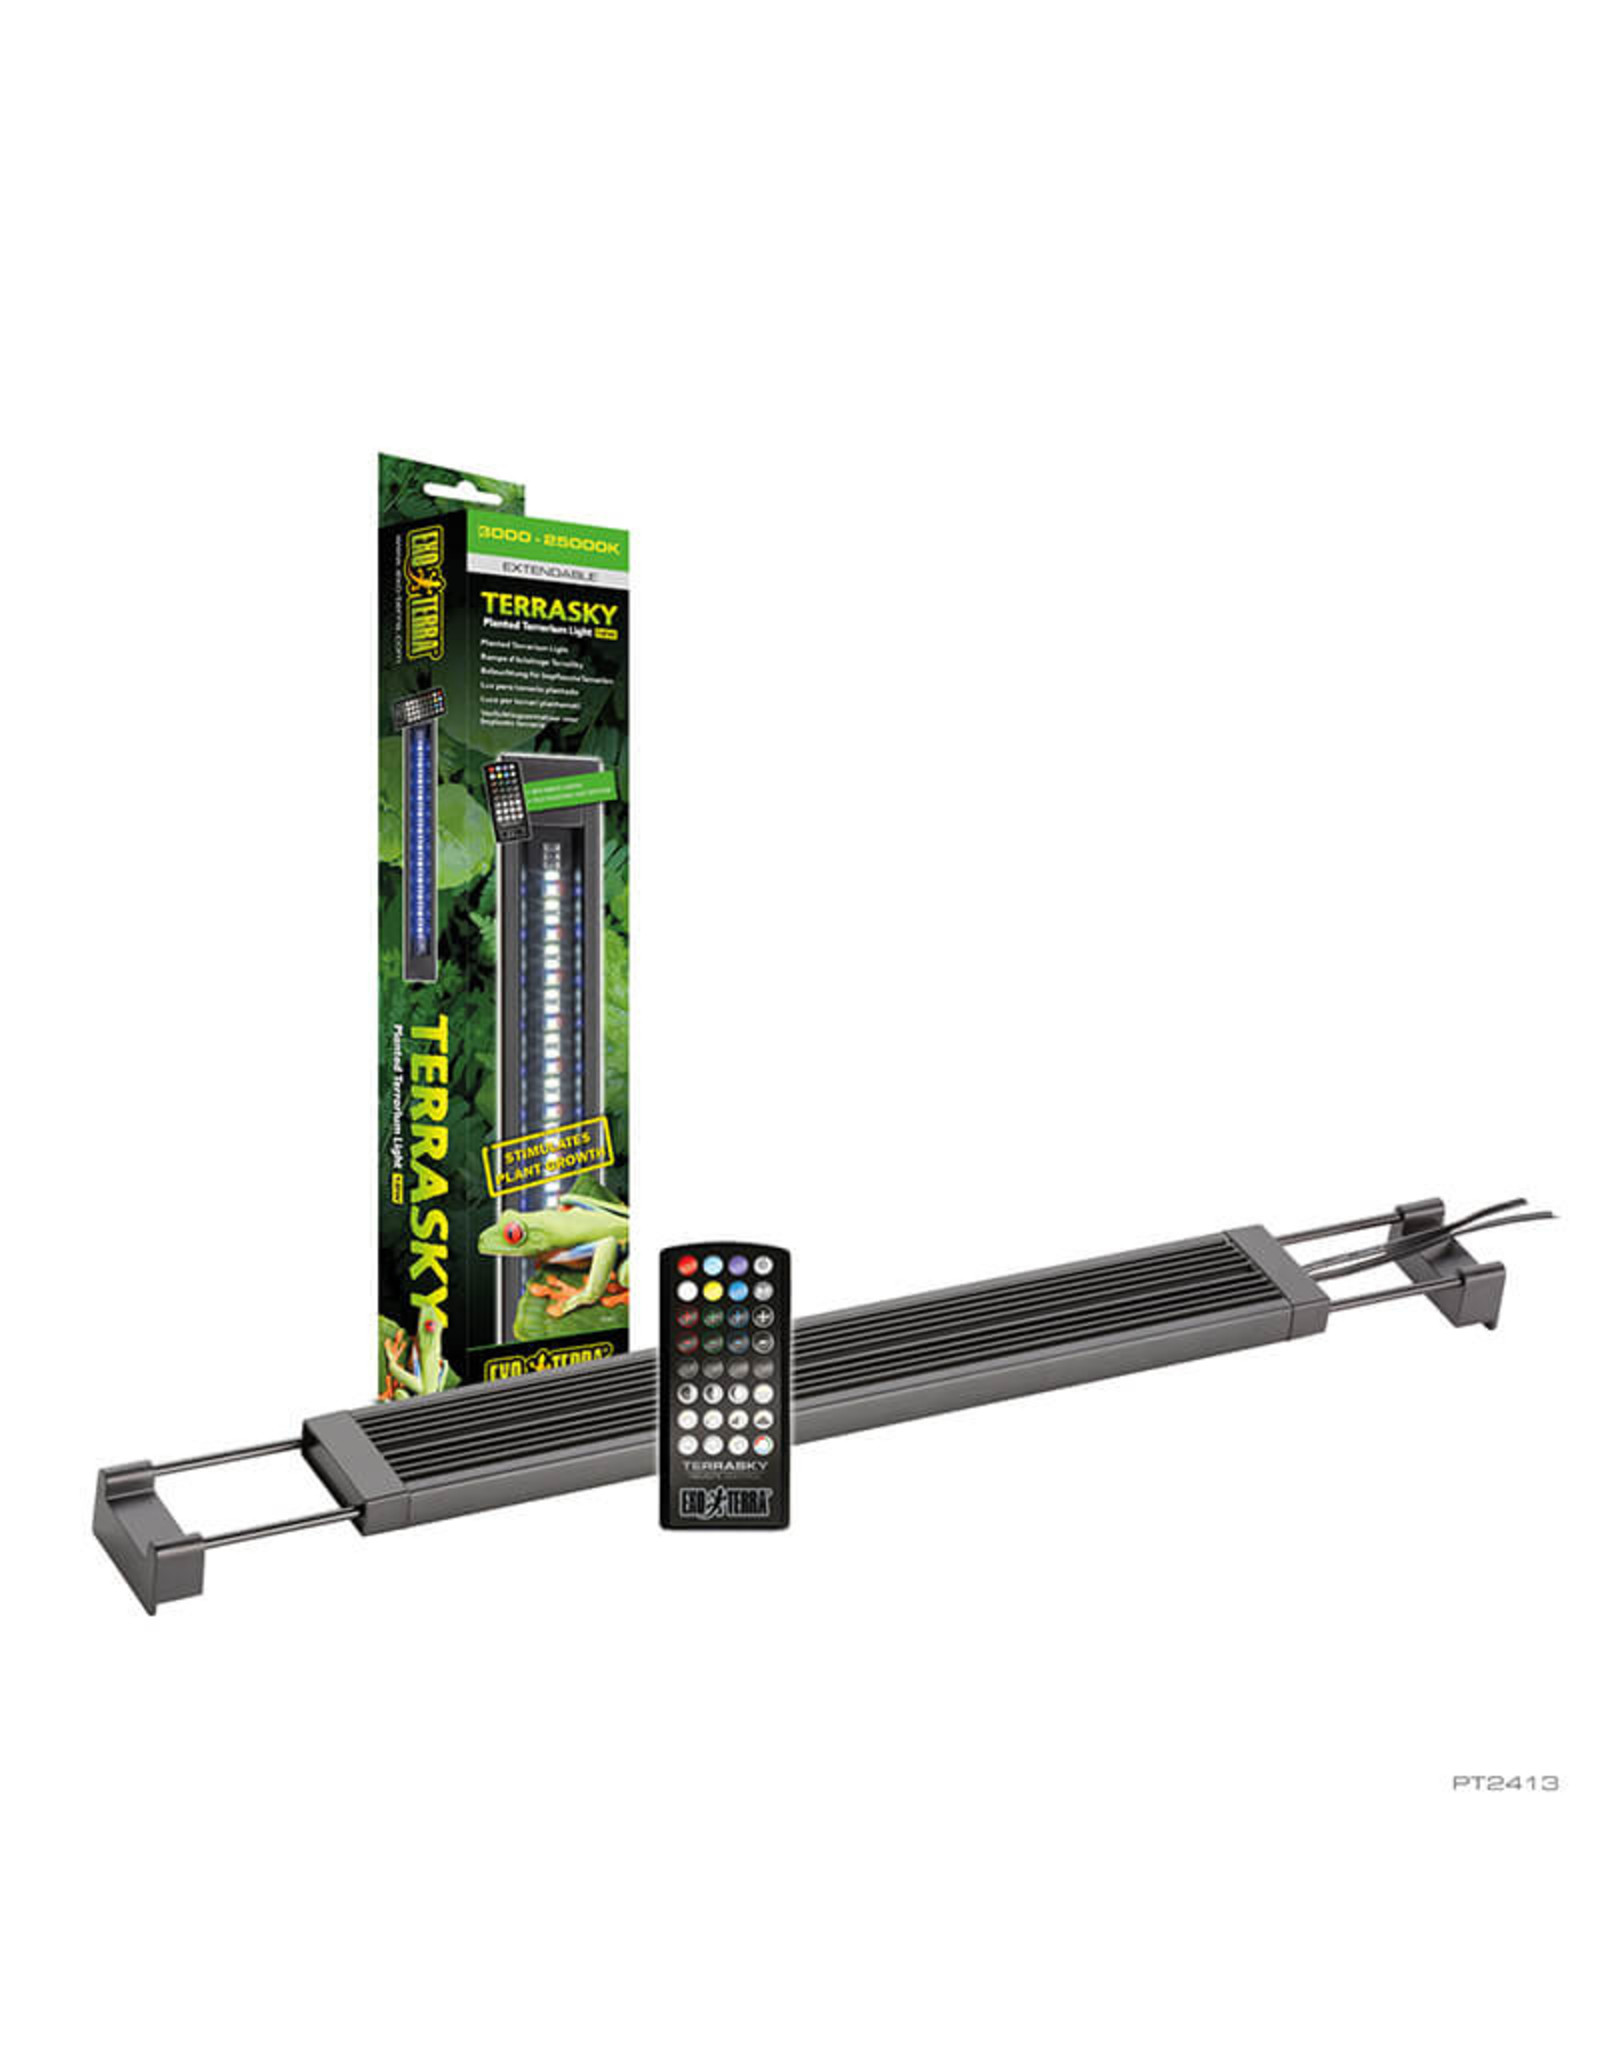 Exo Terra EXO TERRA Terrasky LED Strip w/ Remote